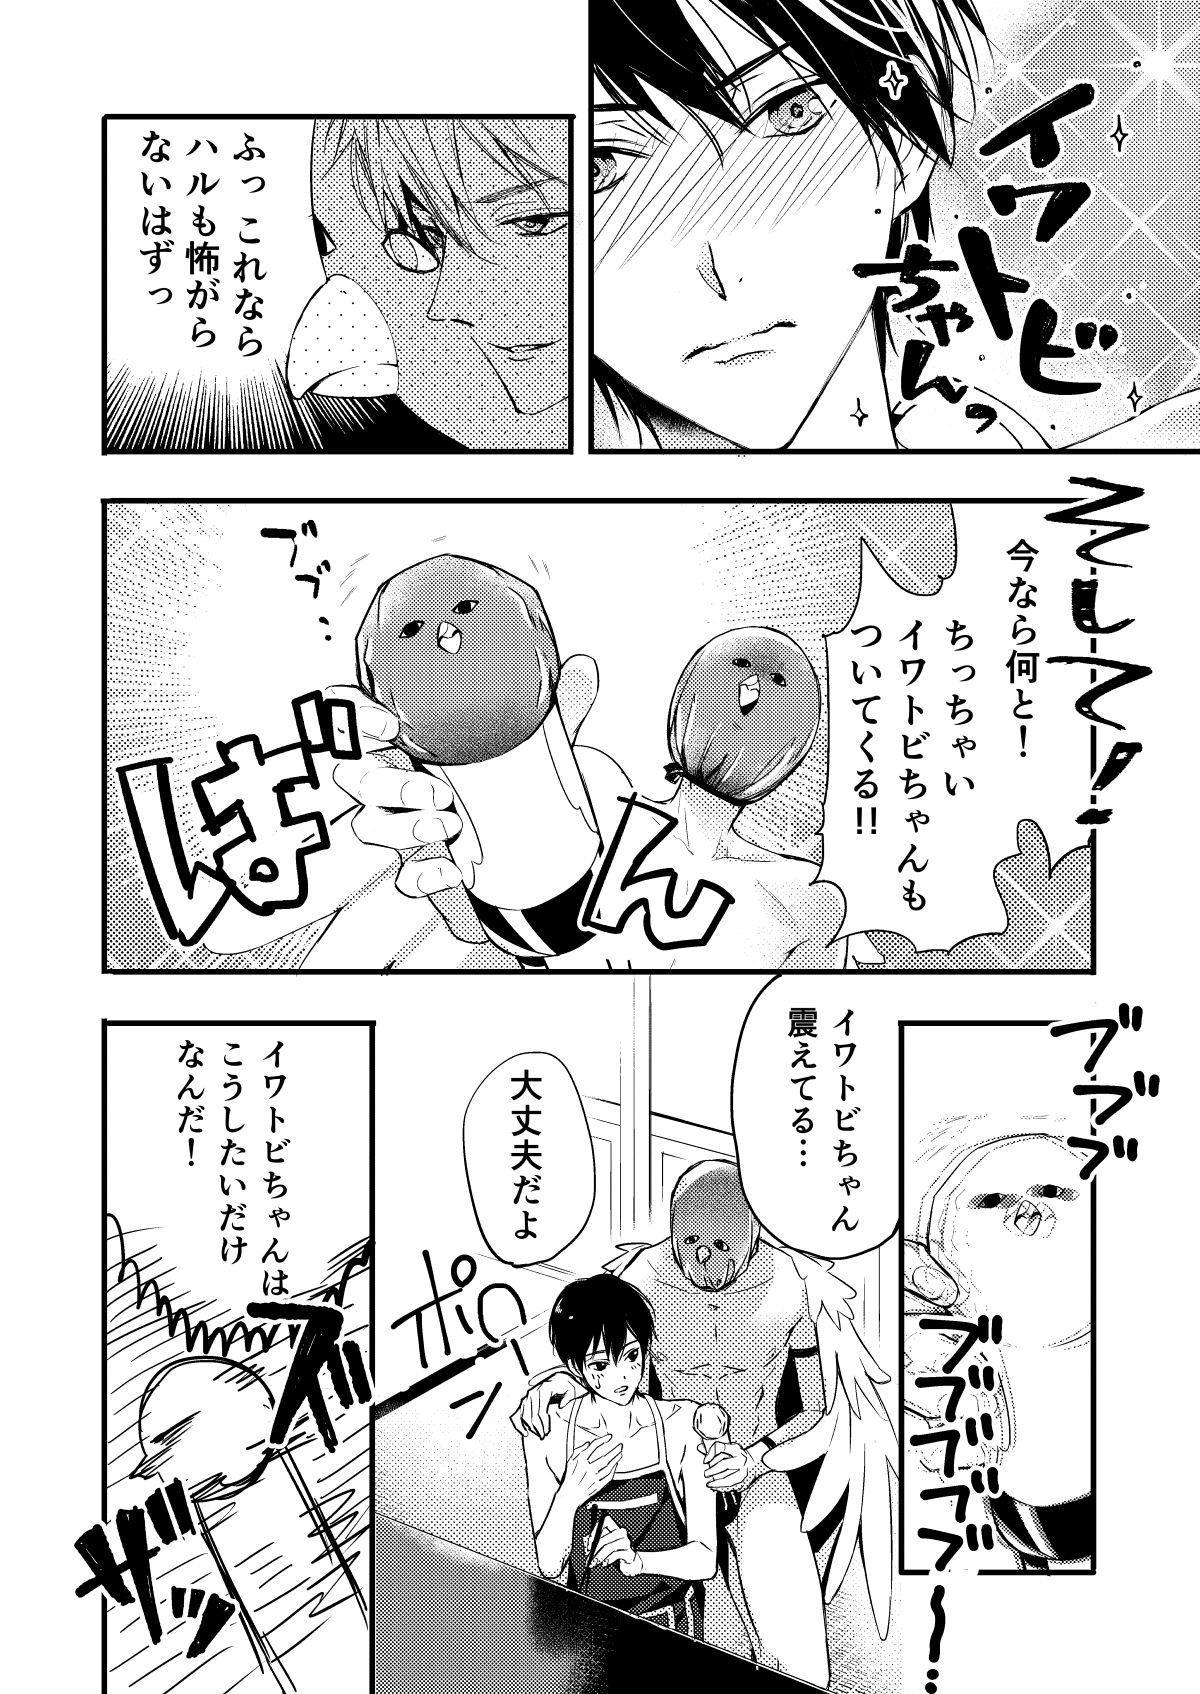 Iwatobi chanto! 7